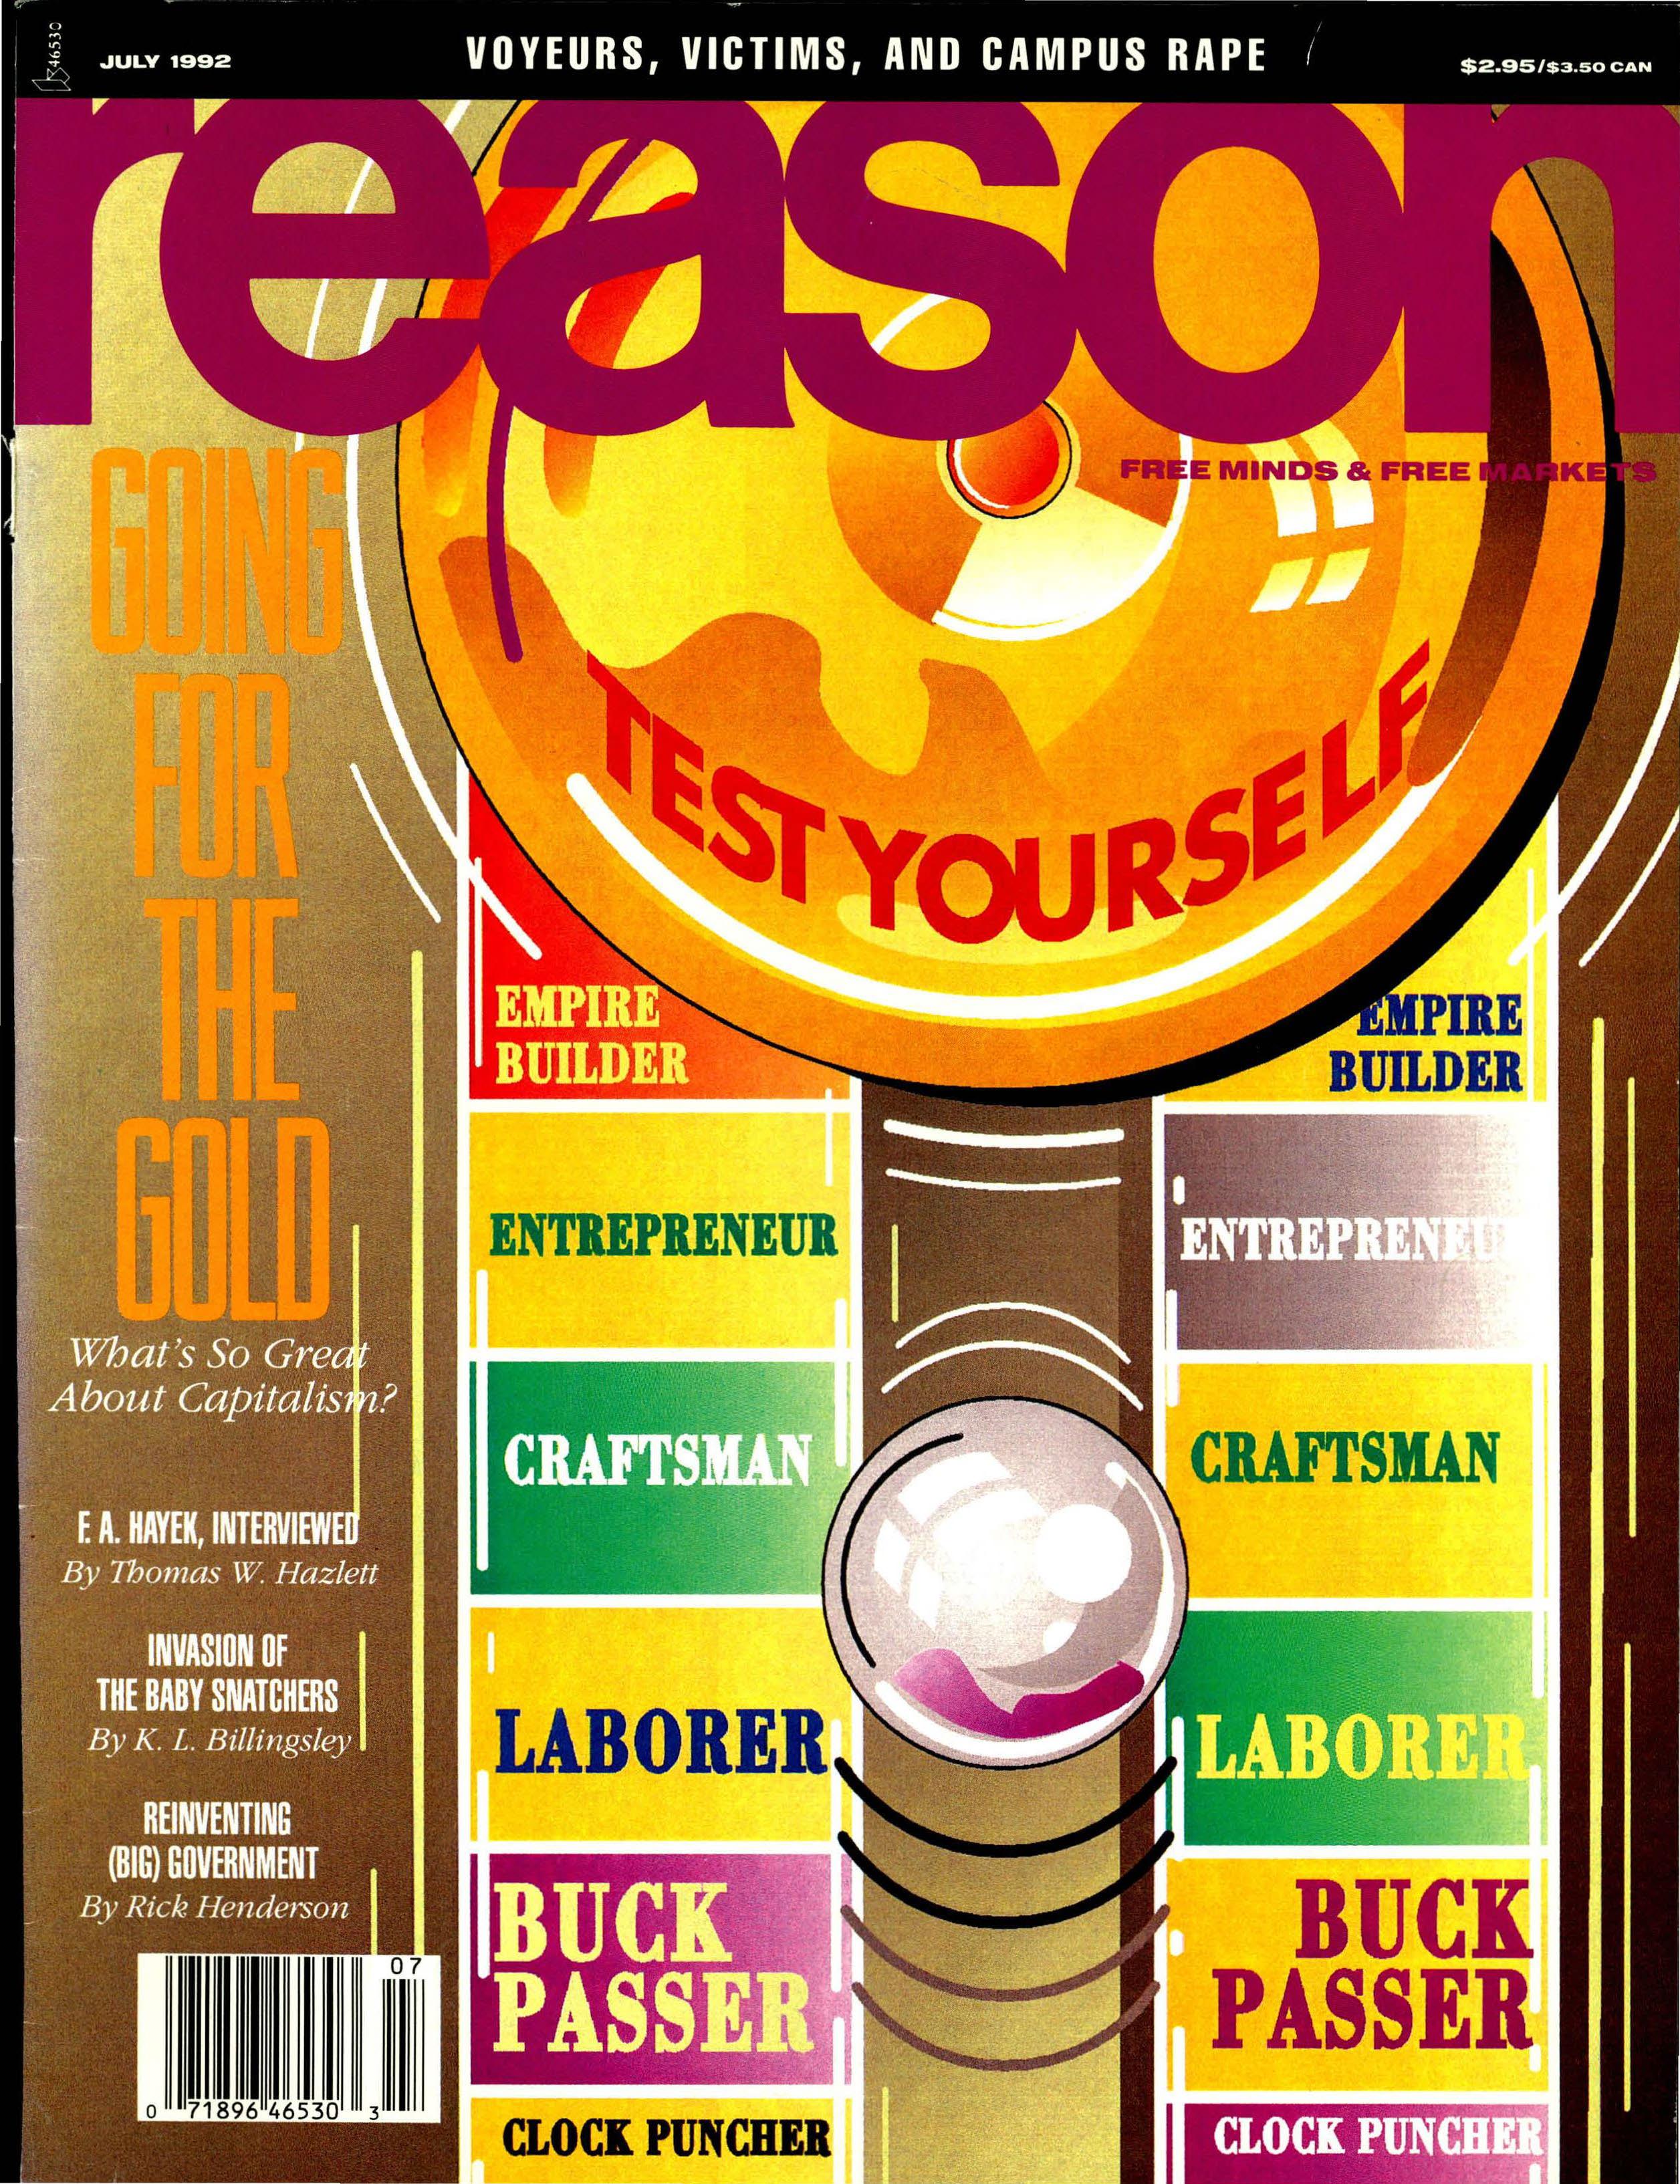 Reason Magazine, July 1992 cover image